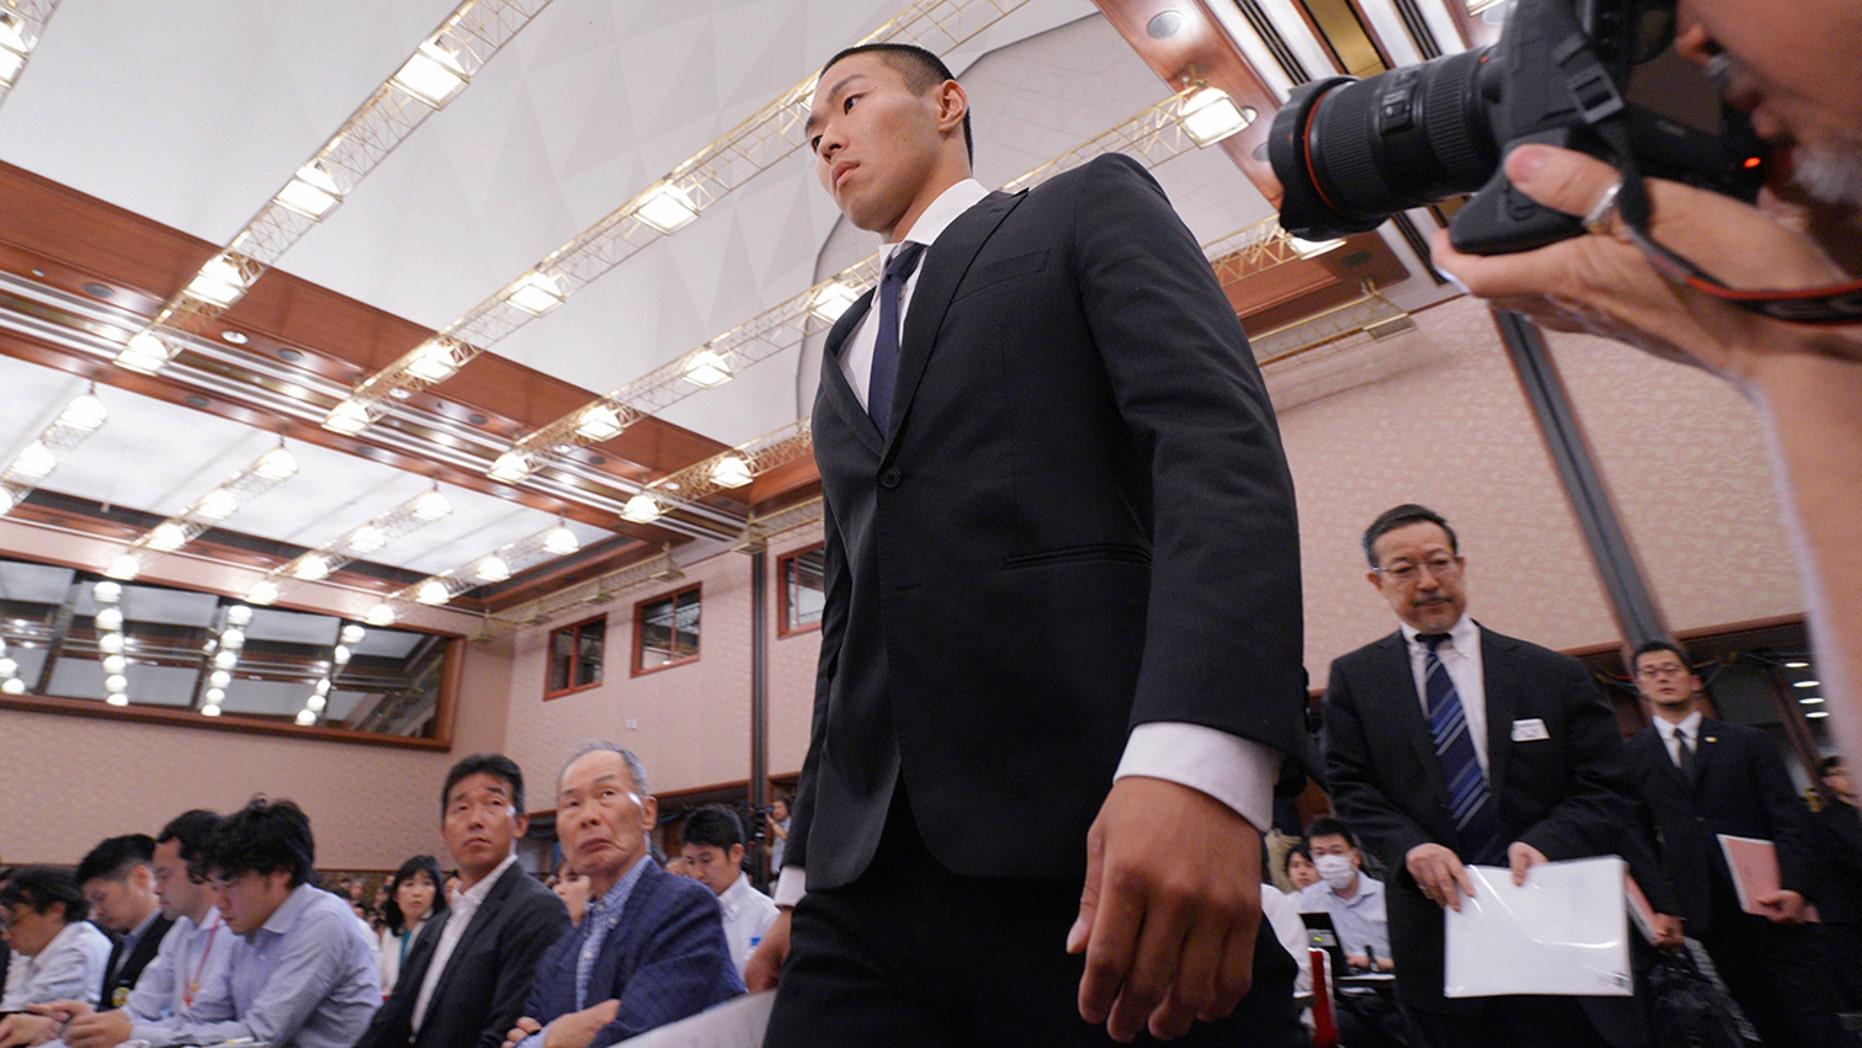 Nihon University's American football player Taisuke Miyagawa arrives for a news conference.